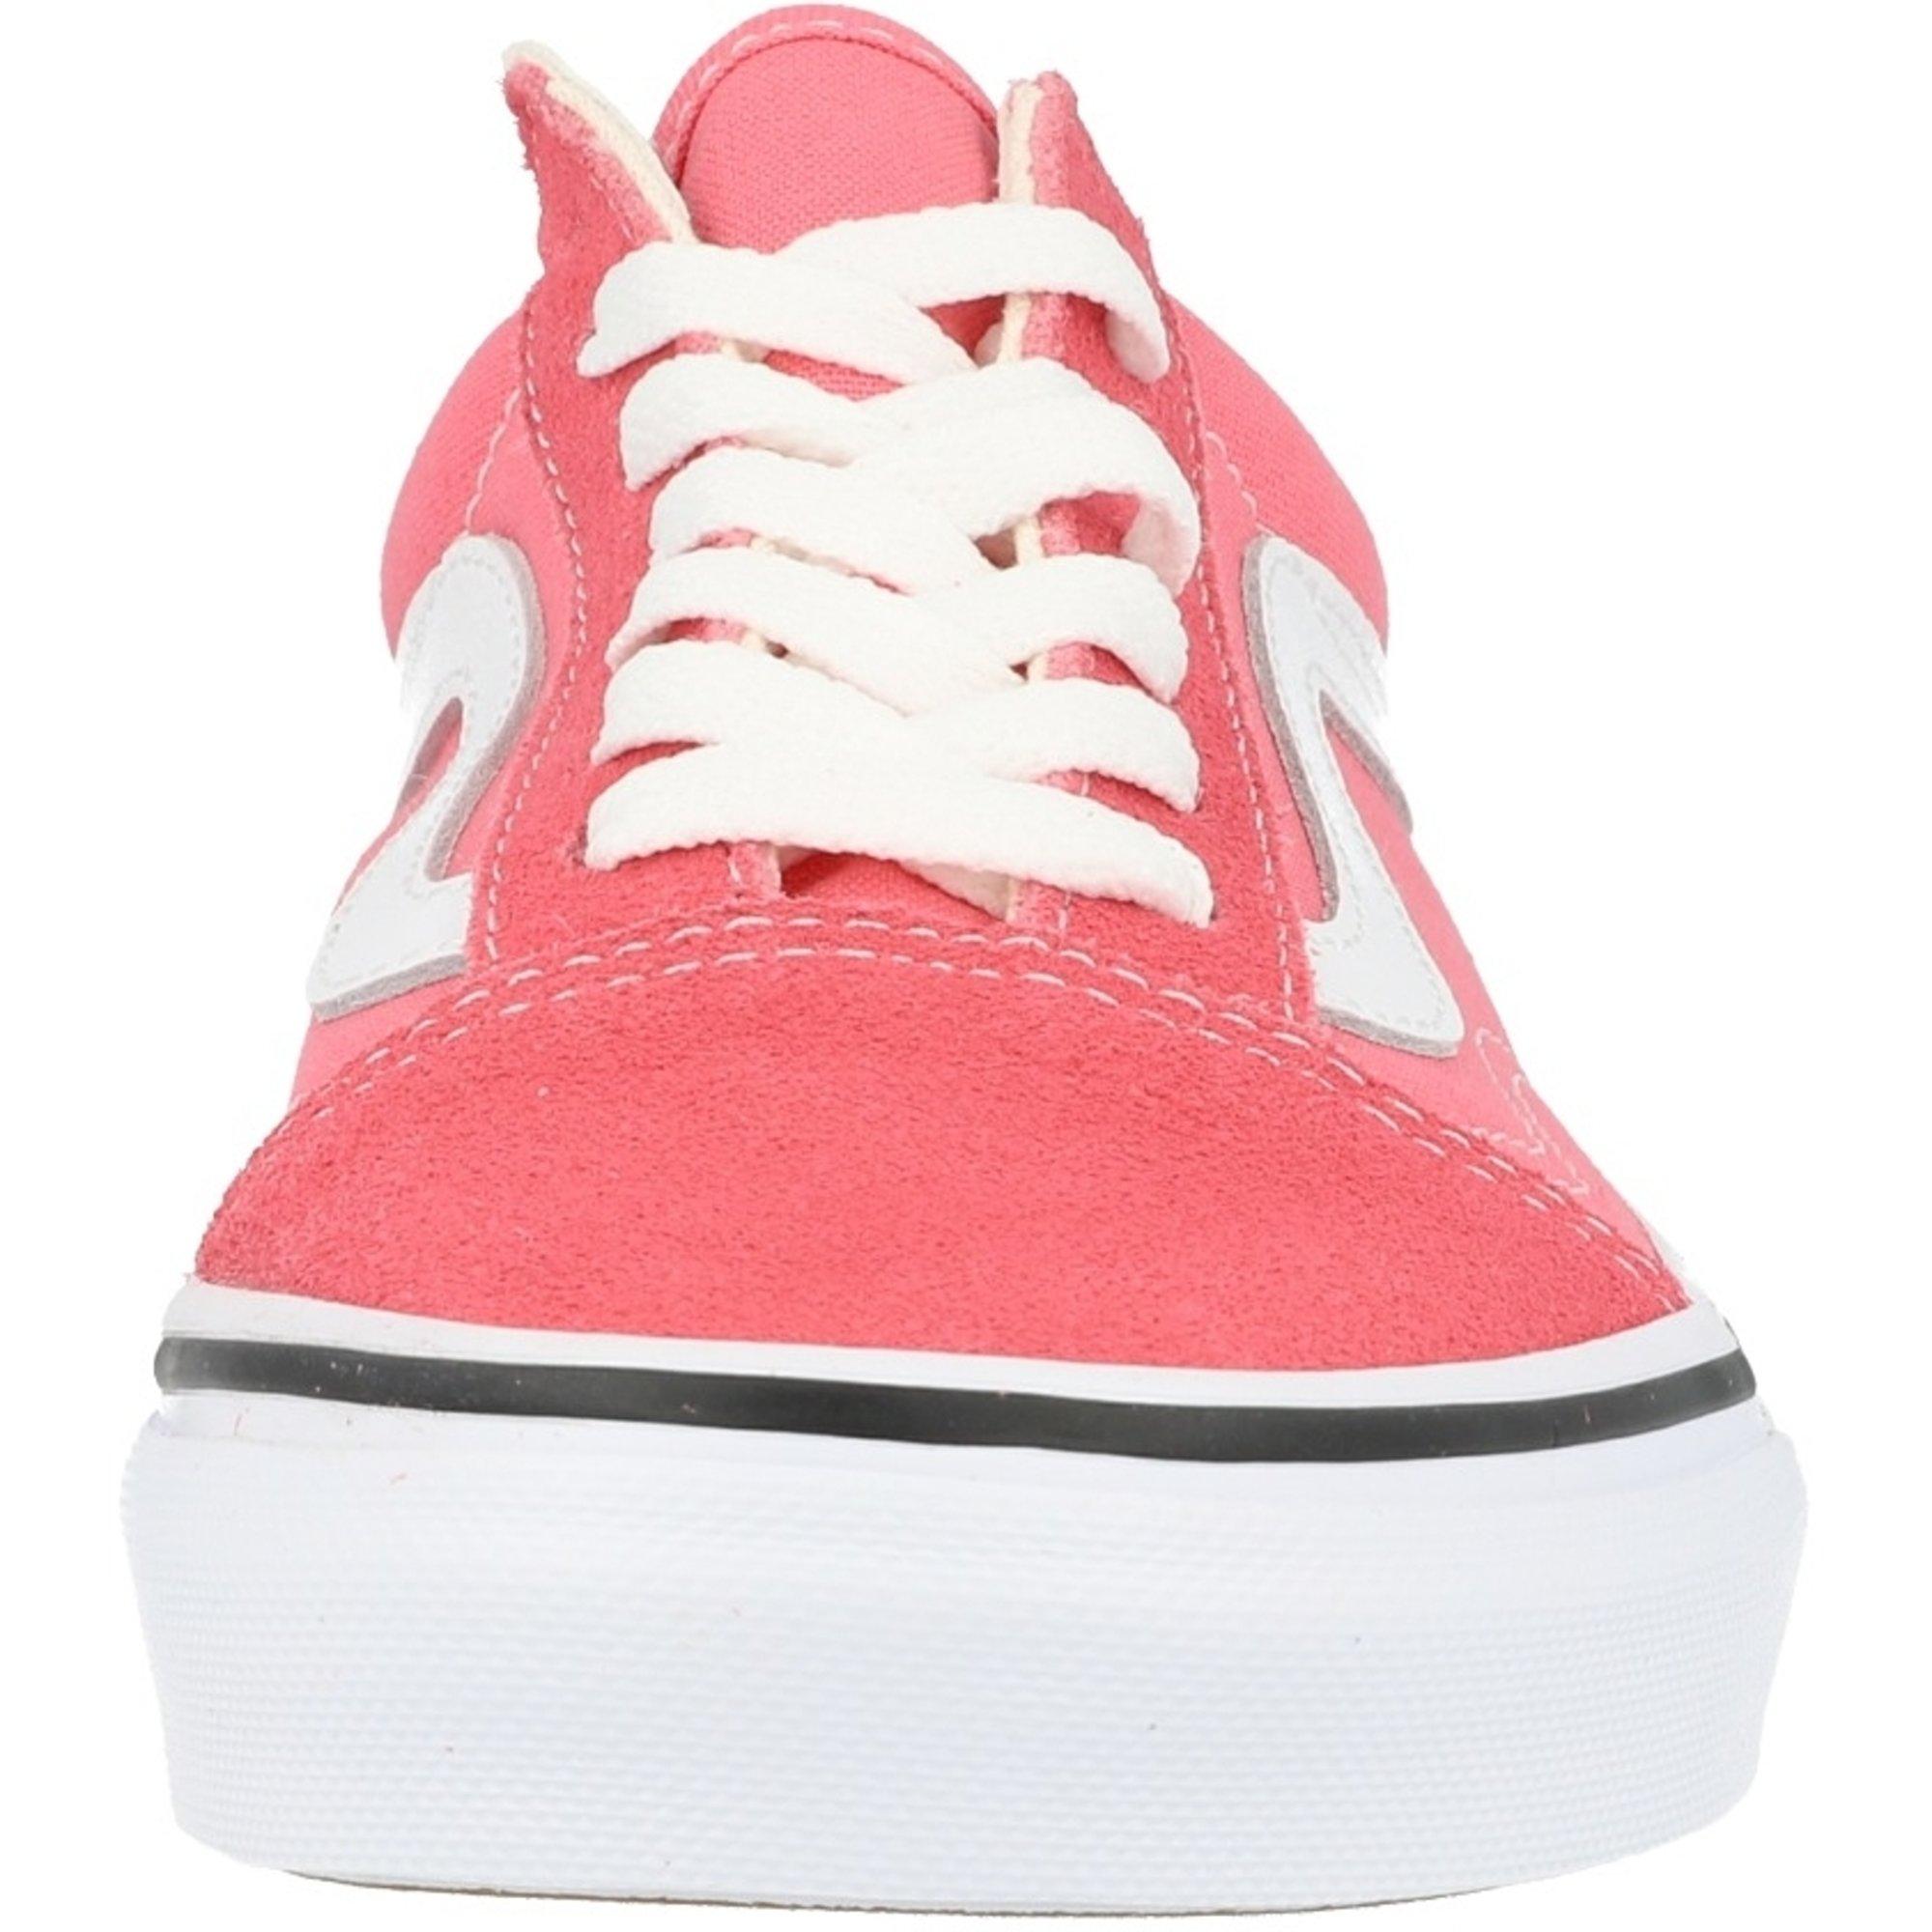 Vans UA Old Skool Strawberry PinkTrue White Textile Adult